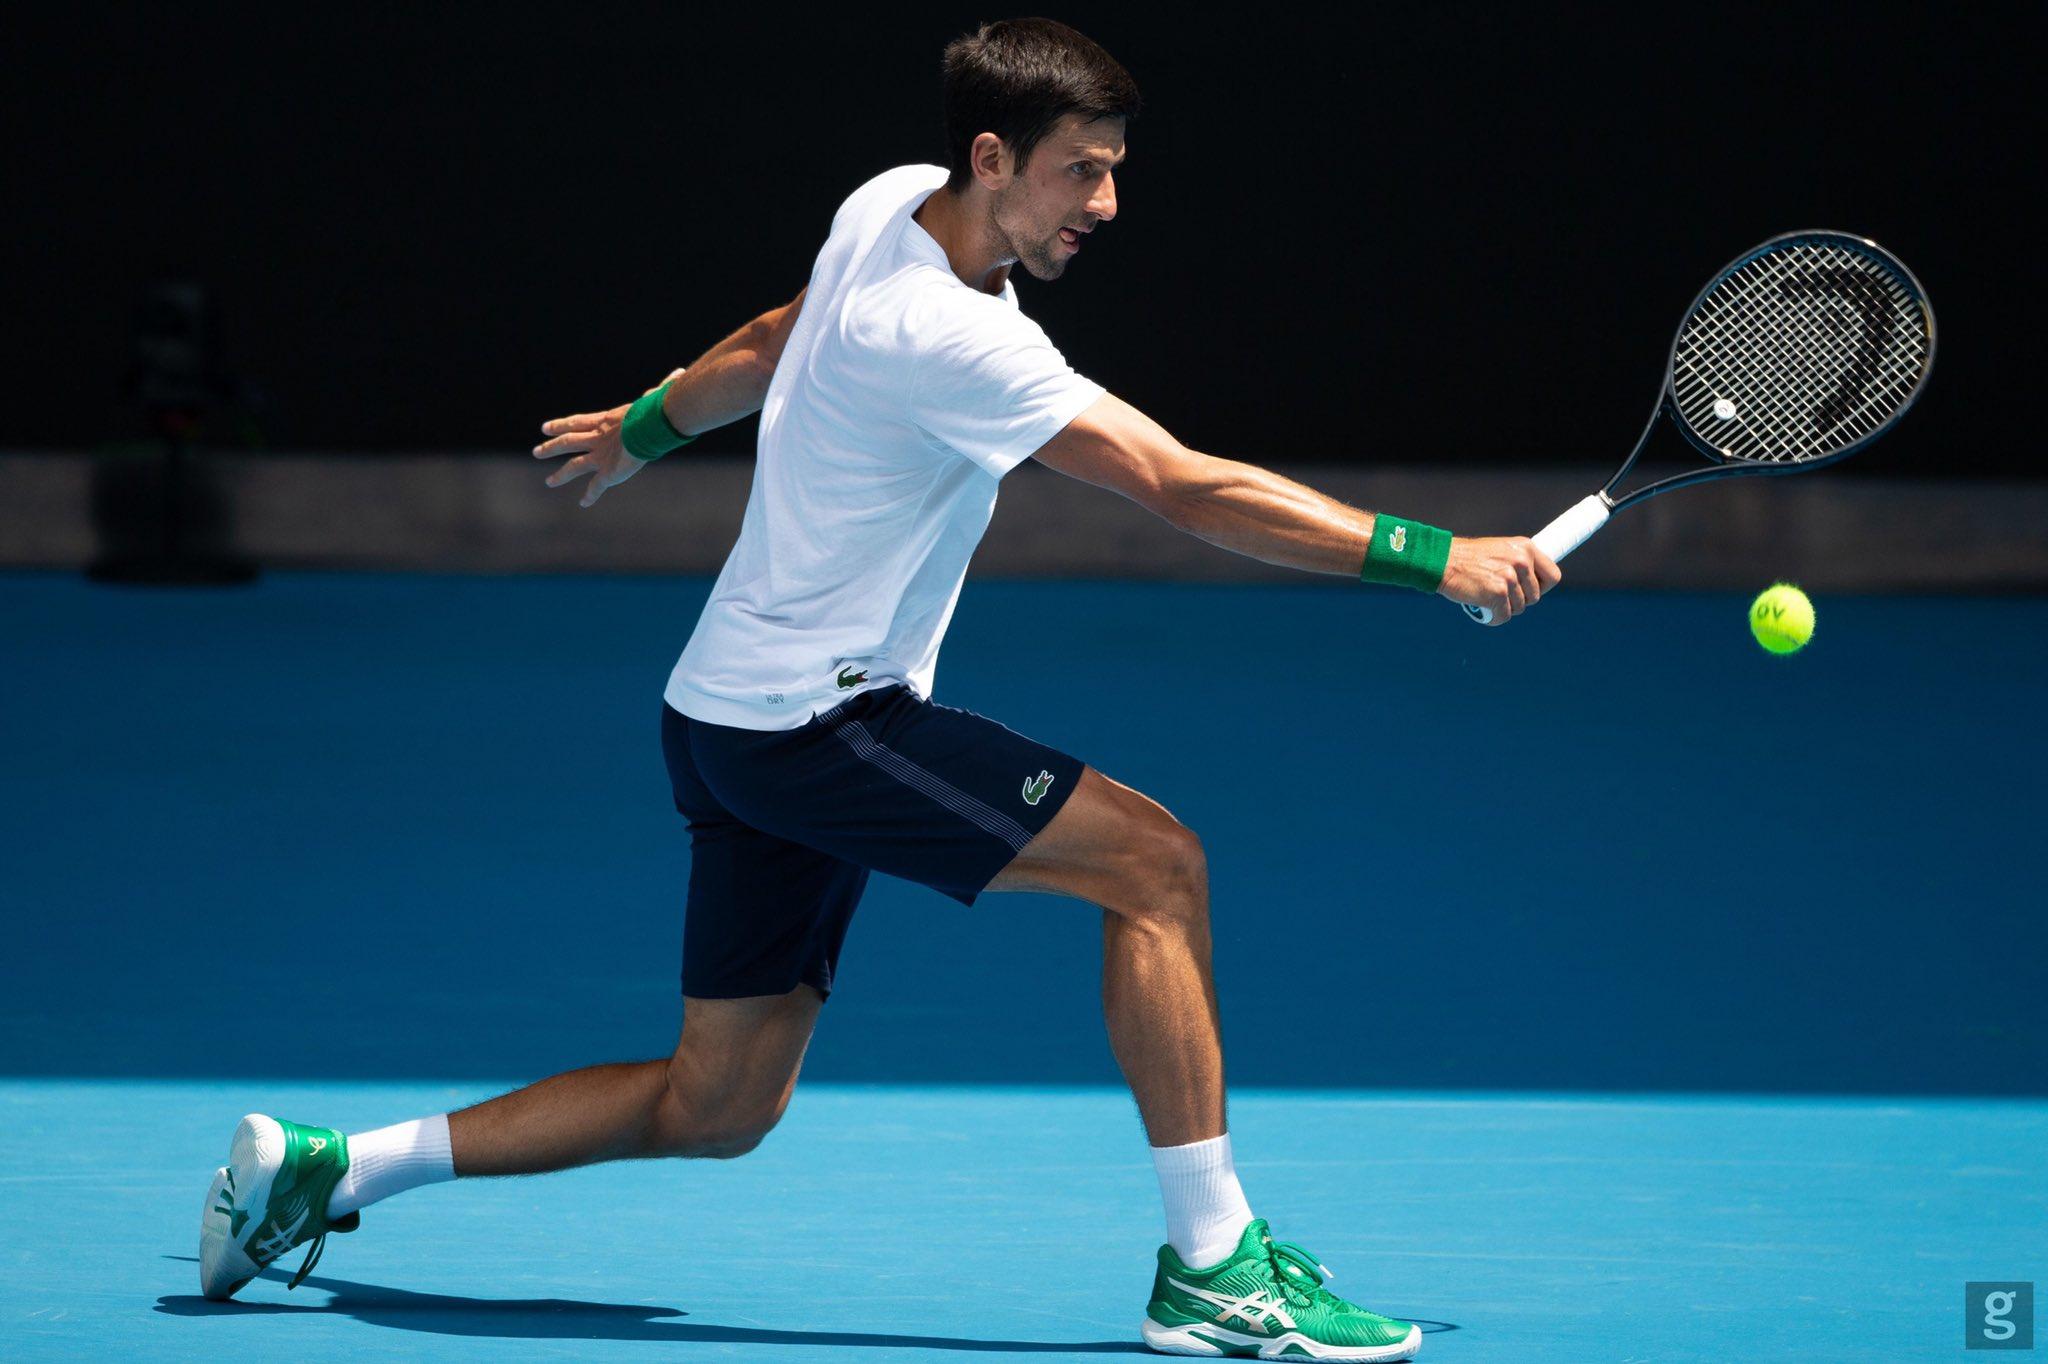 Factbox Tennis Novak Djokovic V Stefanos Tsitsipas Sports Games